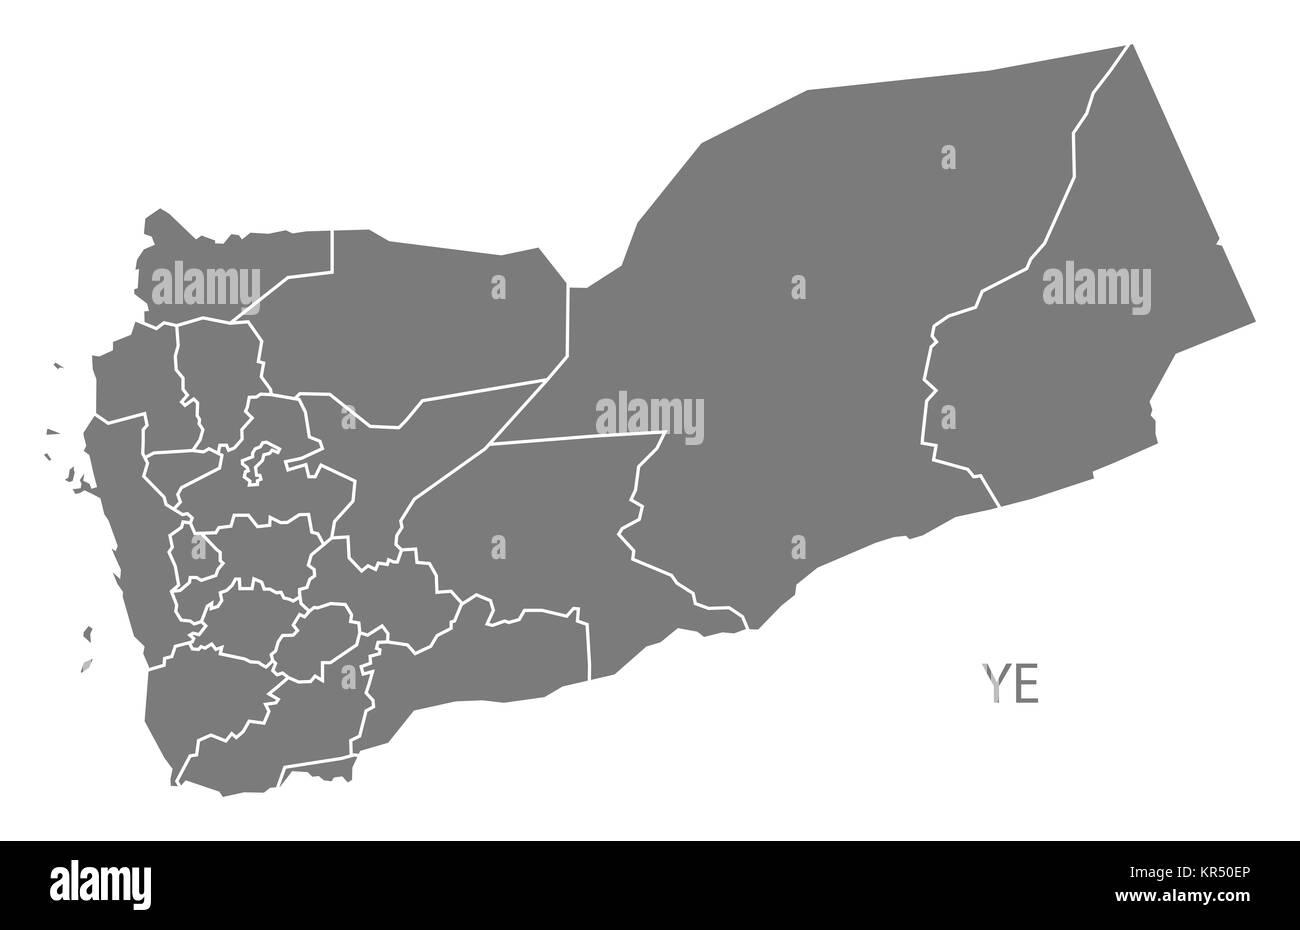 Yemen governorates Map grey - Stock Image